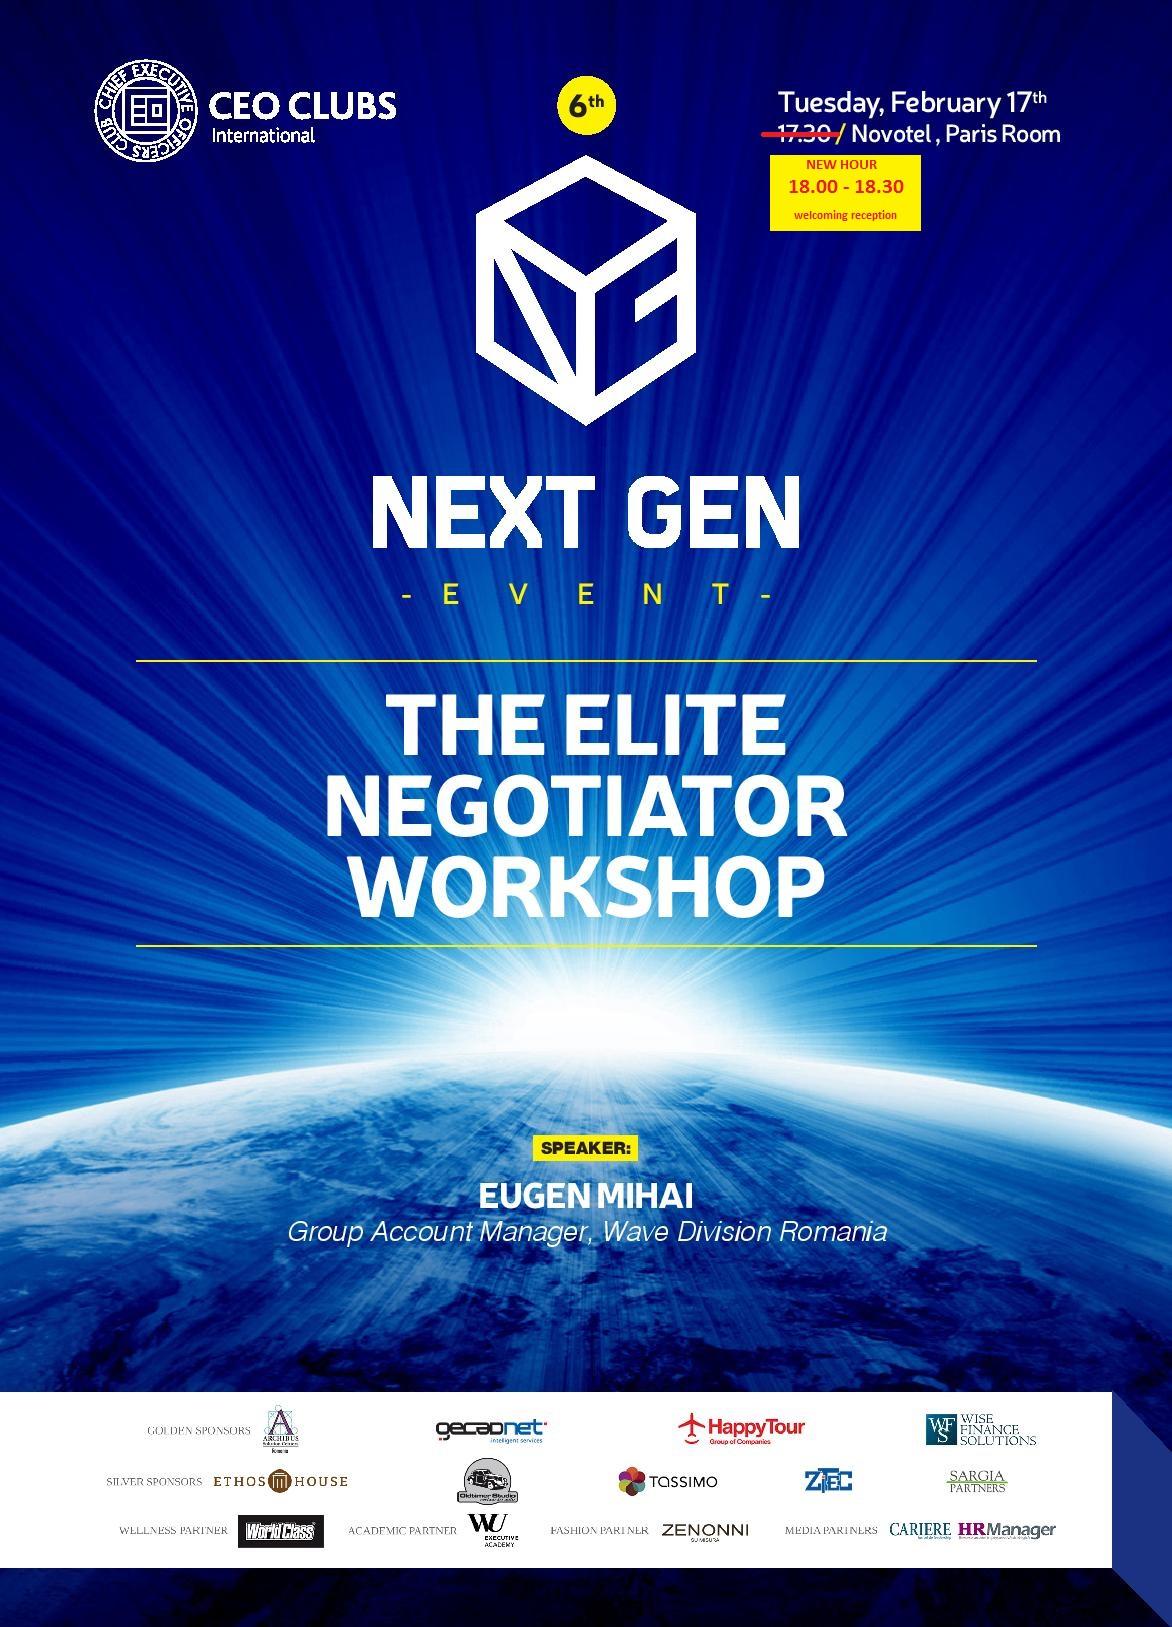 6th Next Gen Event